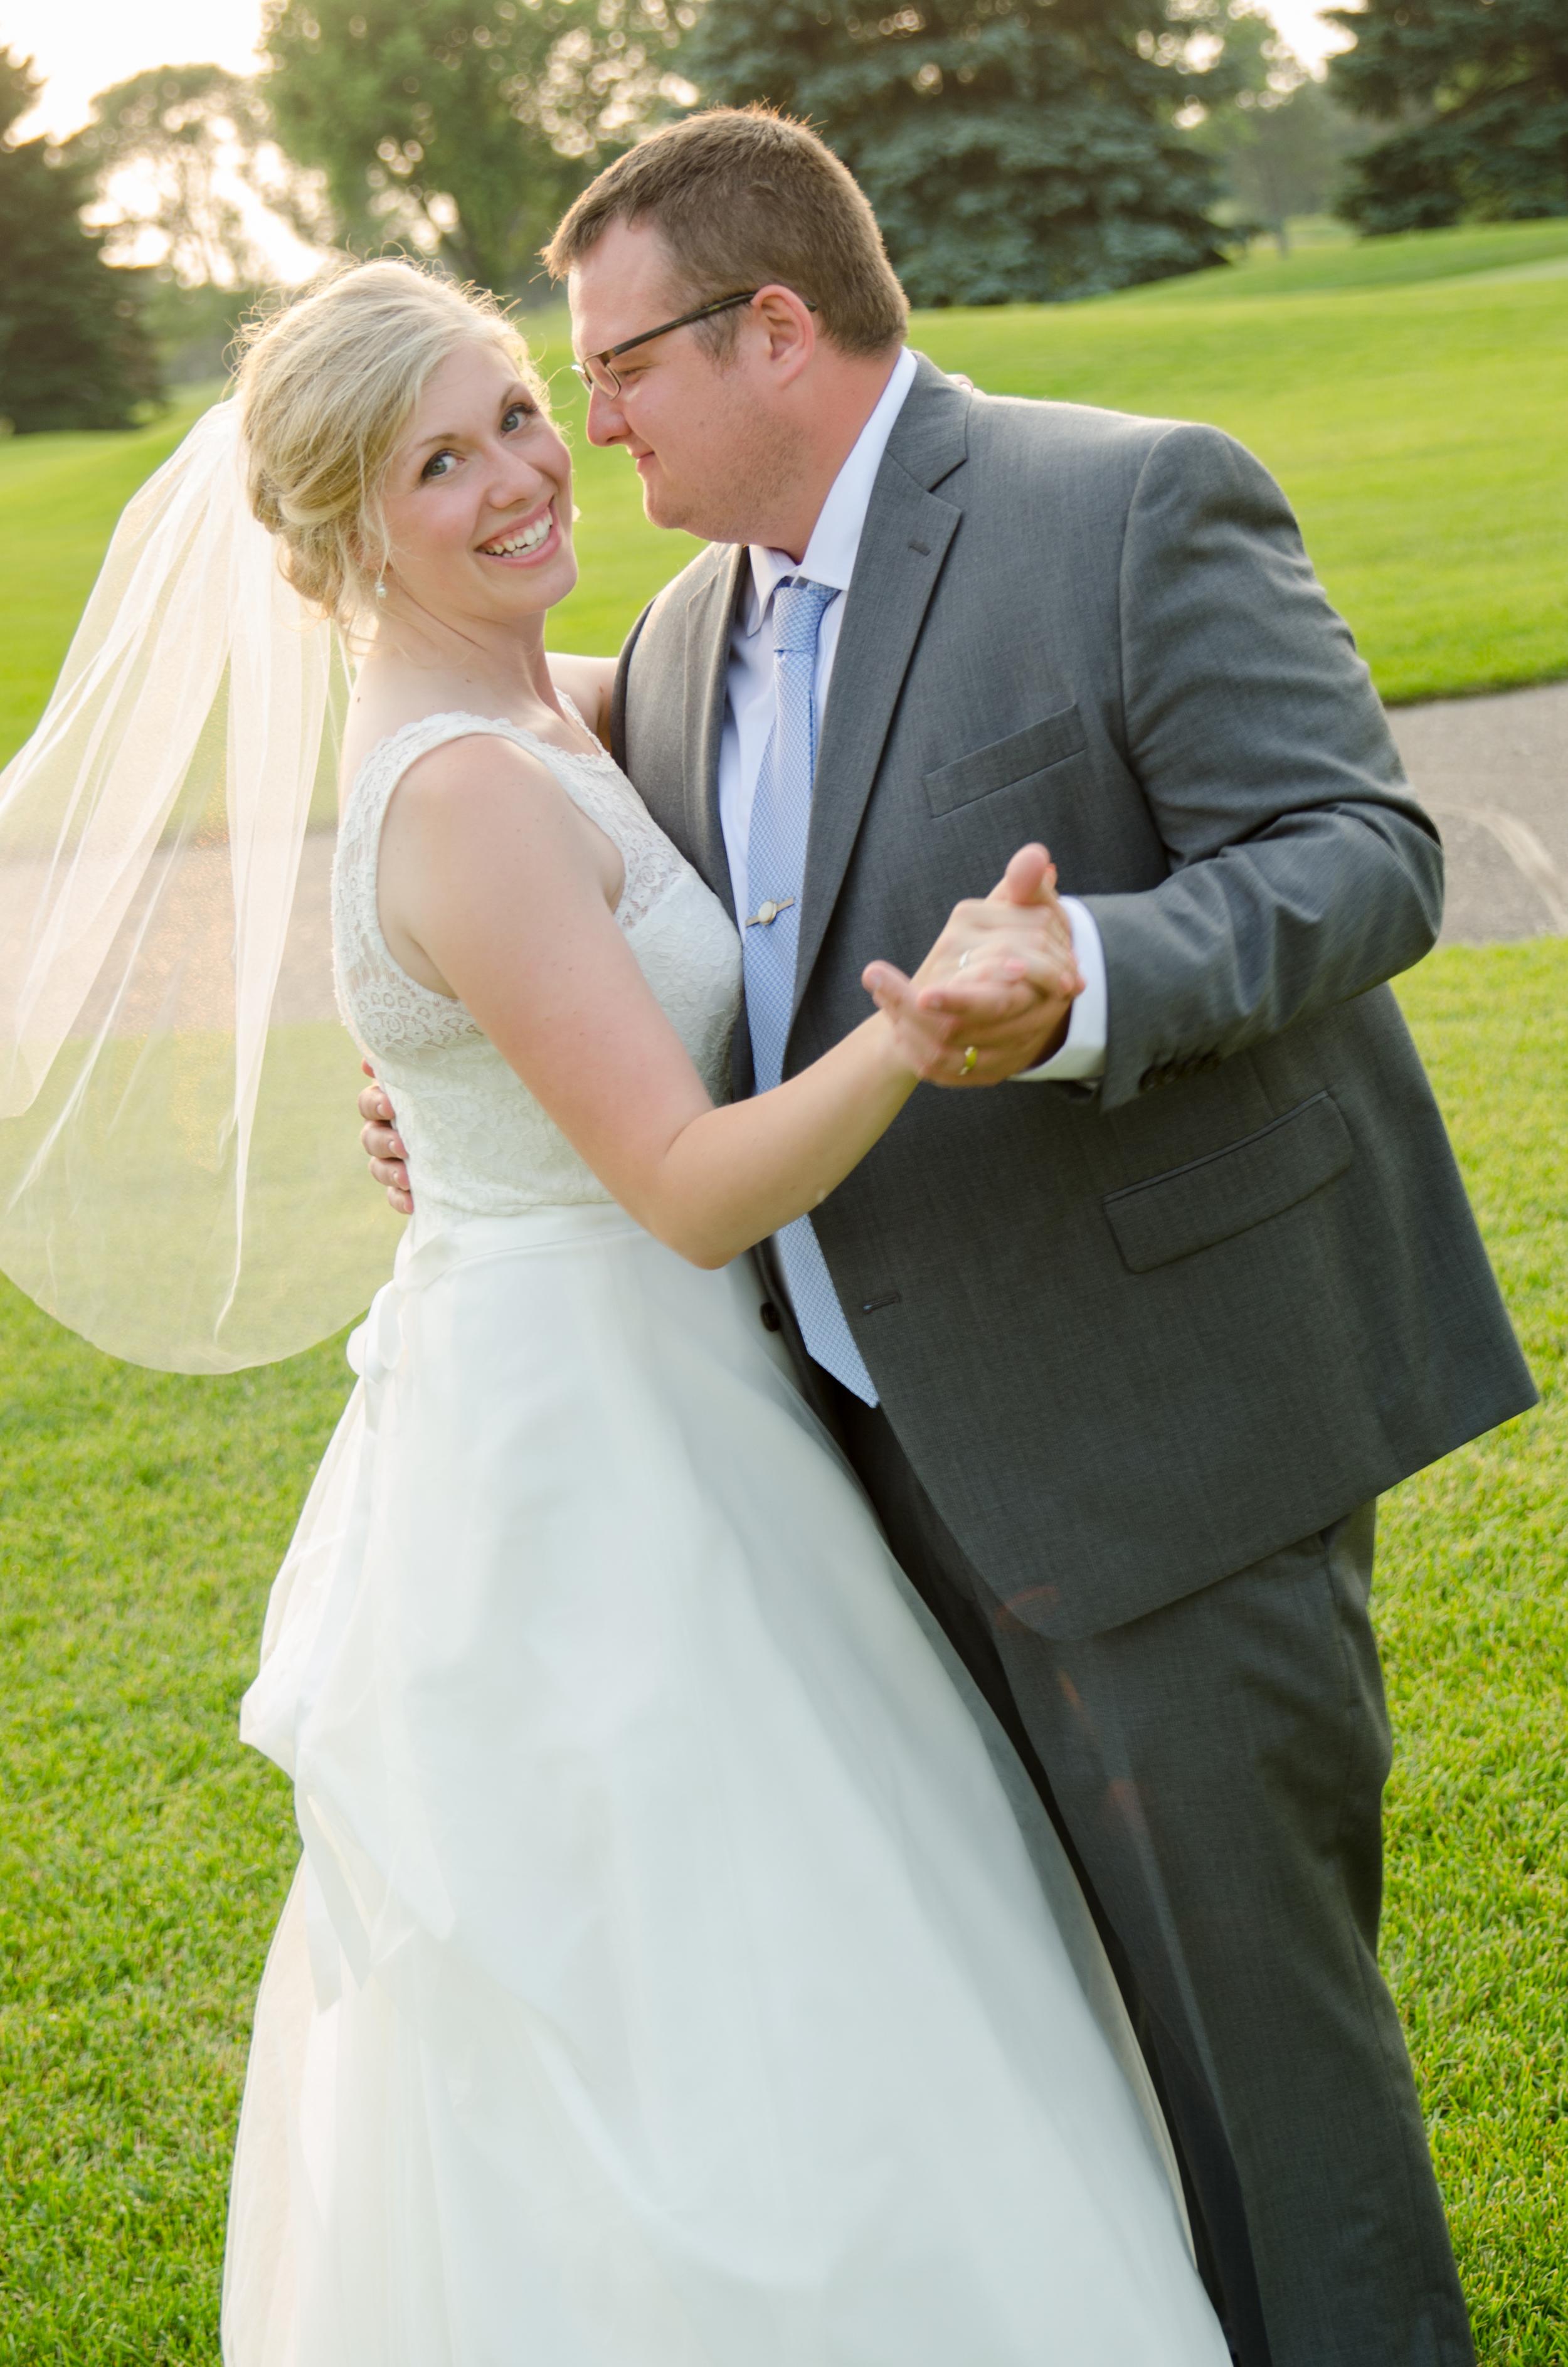 Jessica & Aaron, Minneapolis couple